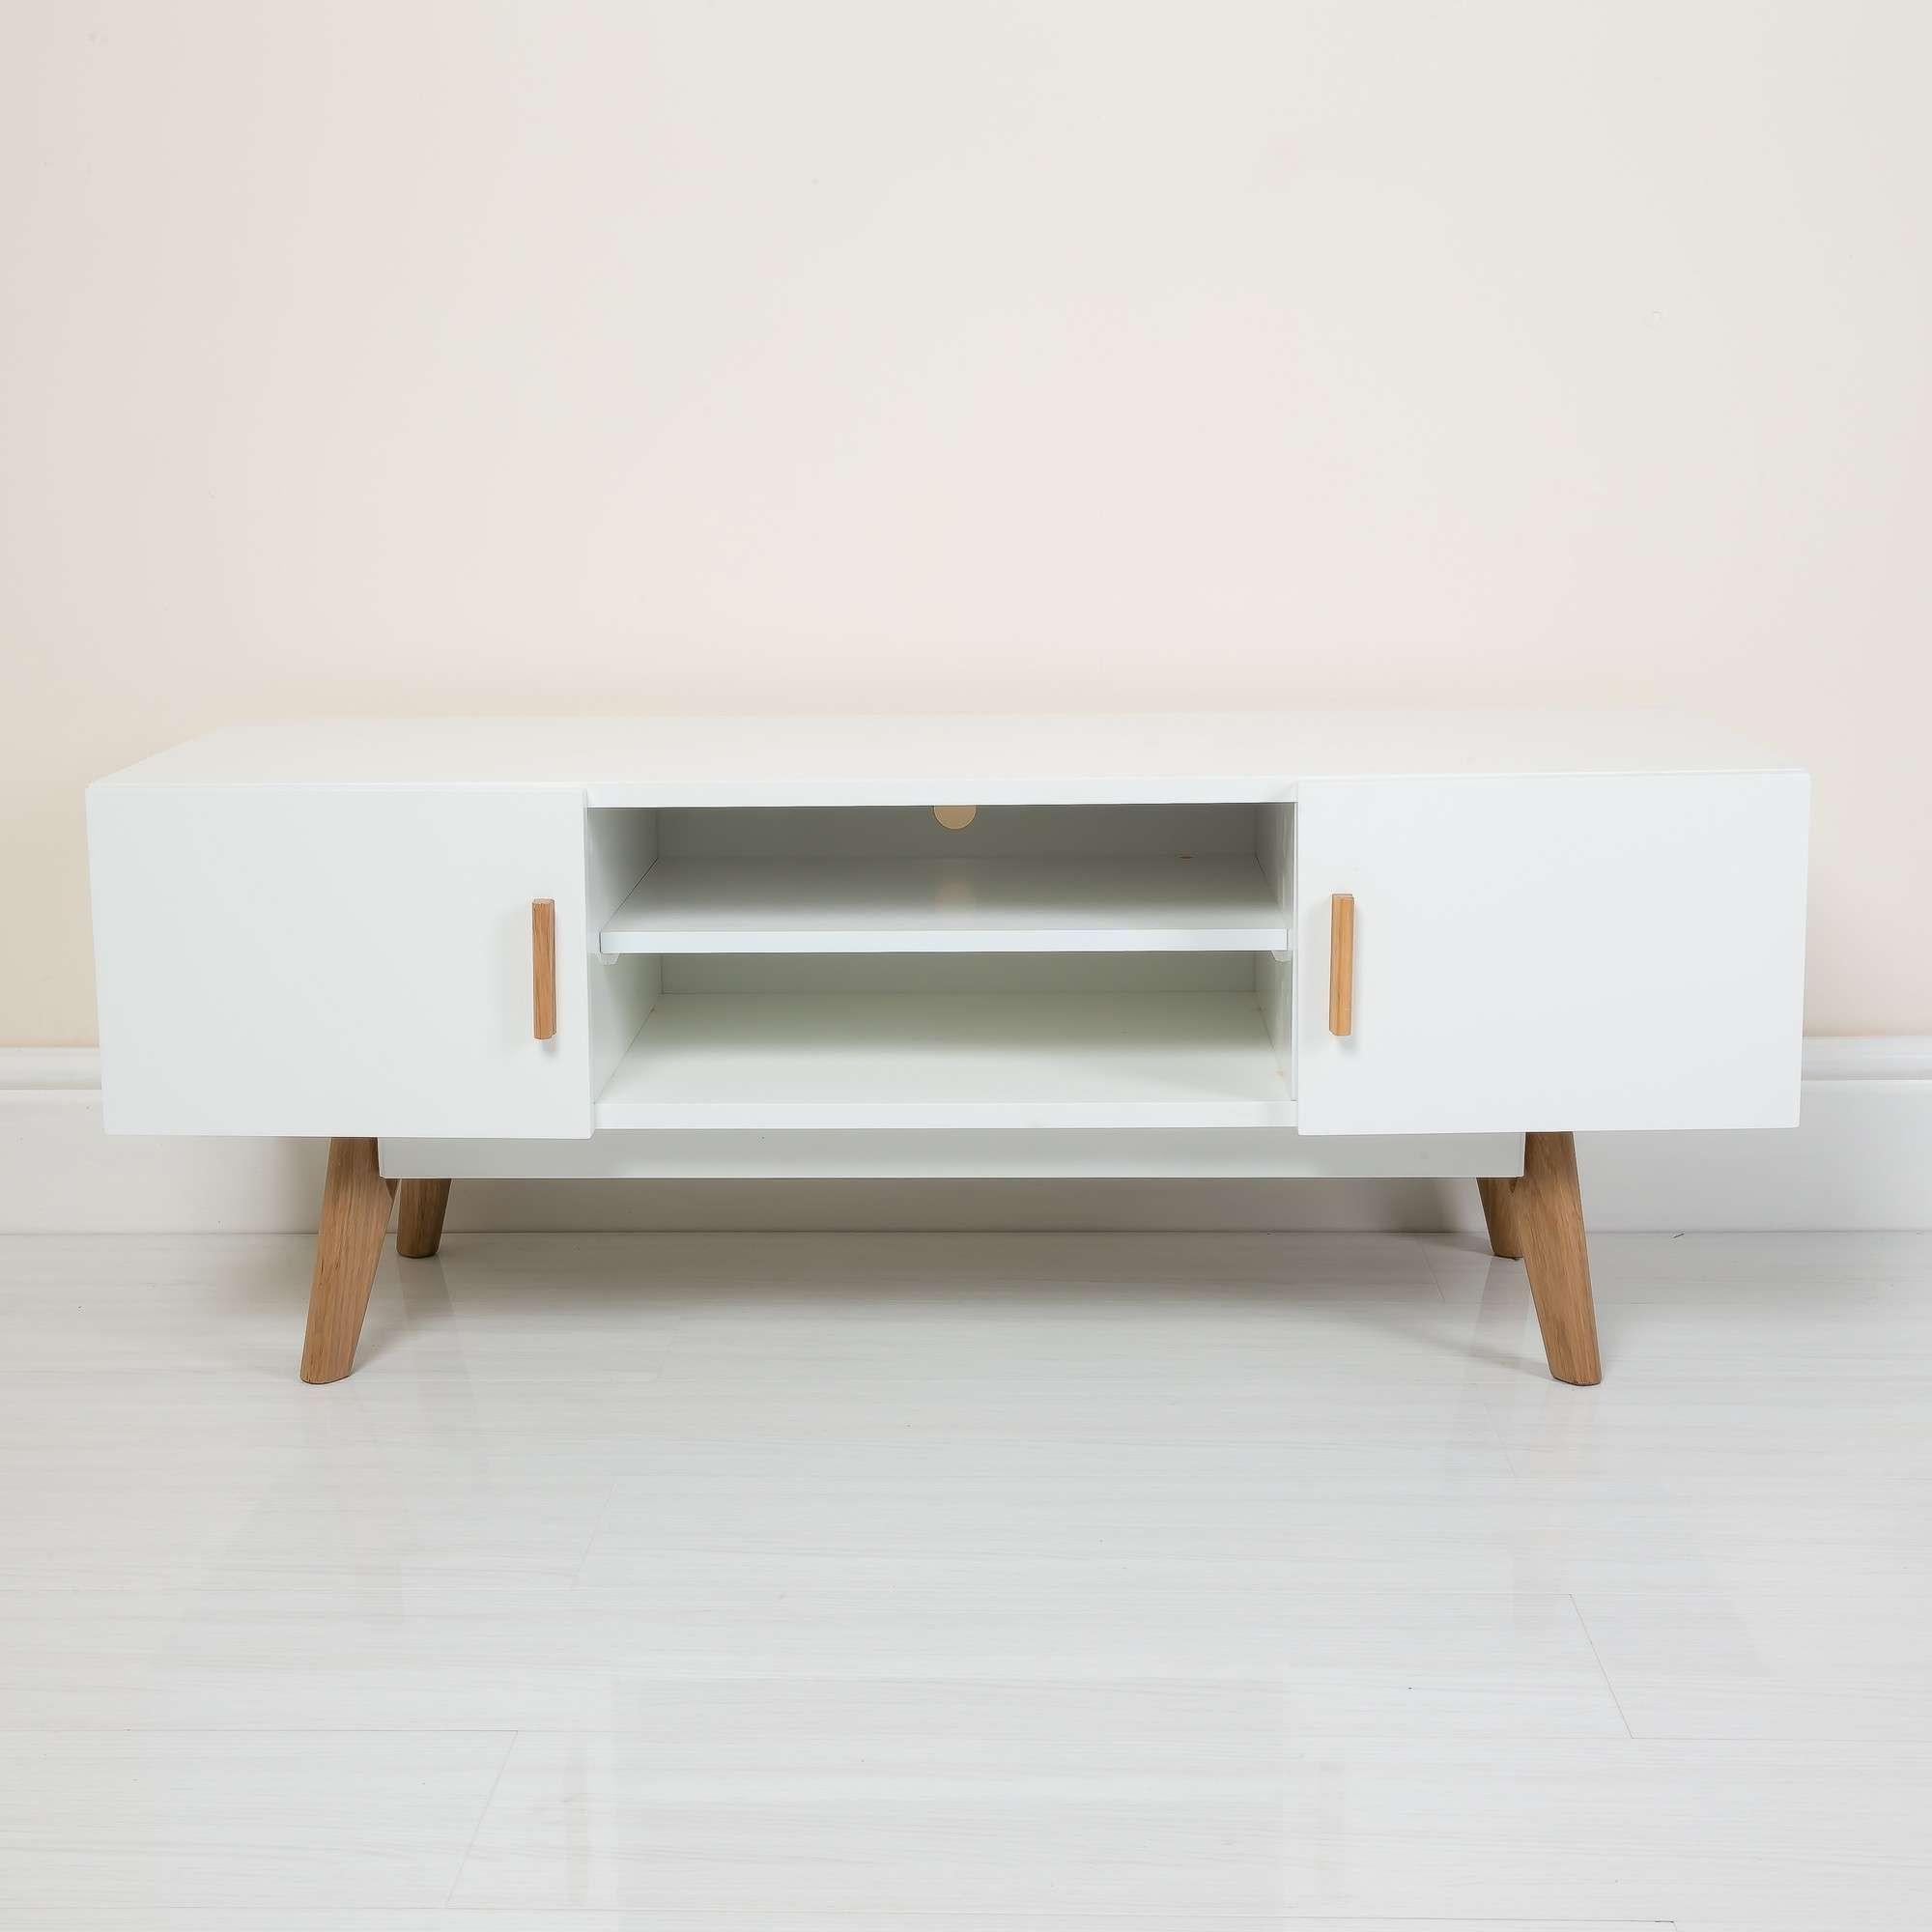 Tv : Likable Scandinavian Tv Stand Uk Brilliant Scandinavian For Scandinavian Design Tv Cabinets (View 13 of 20)